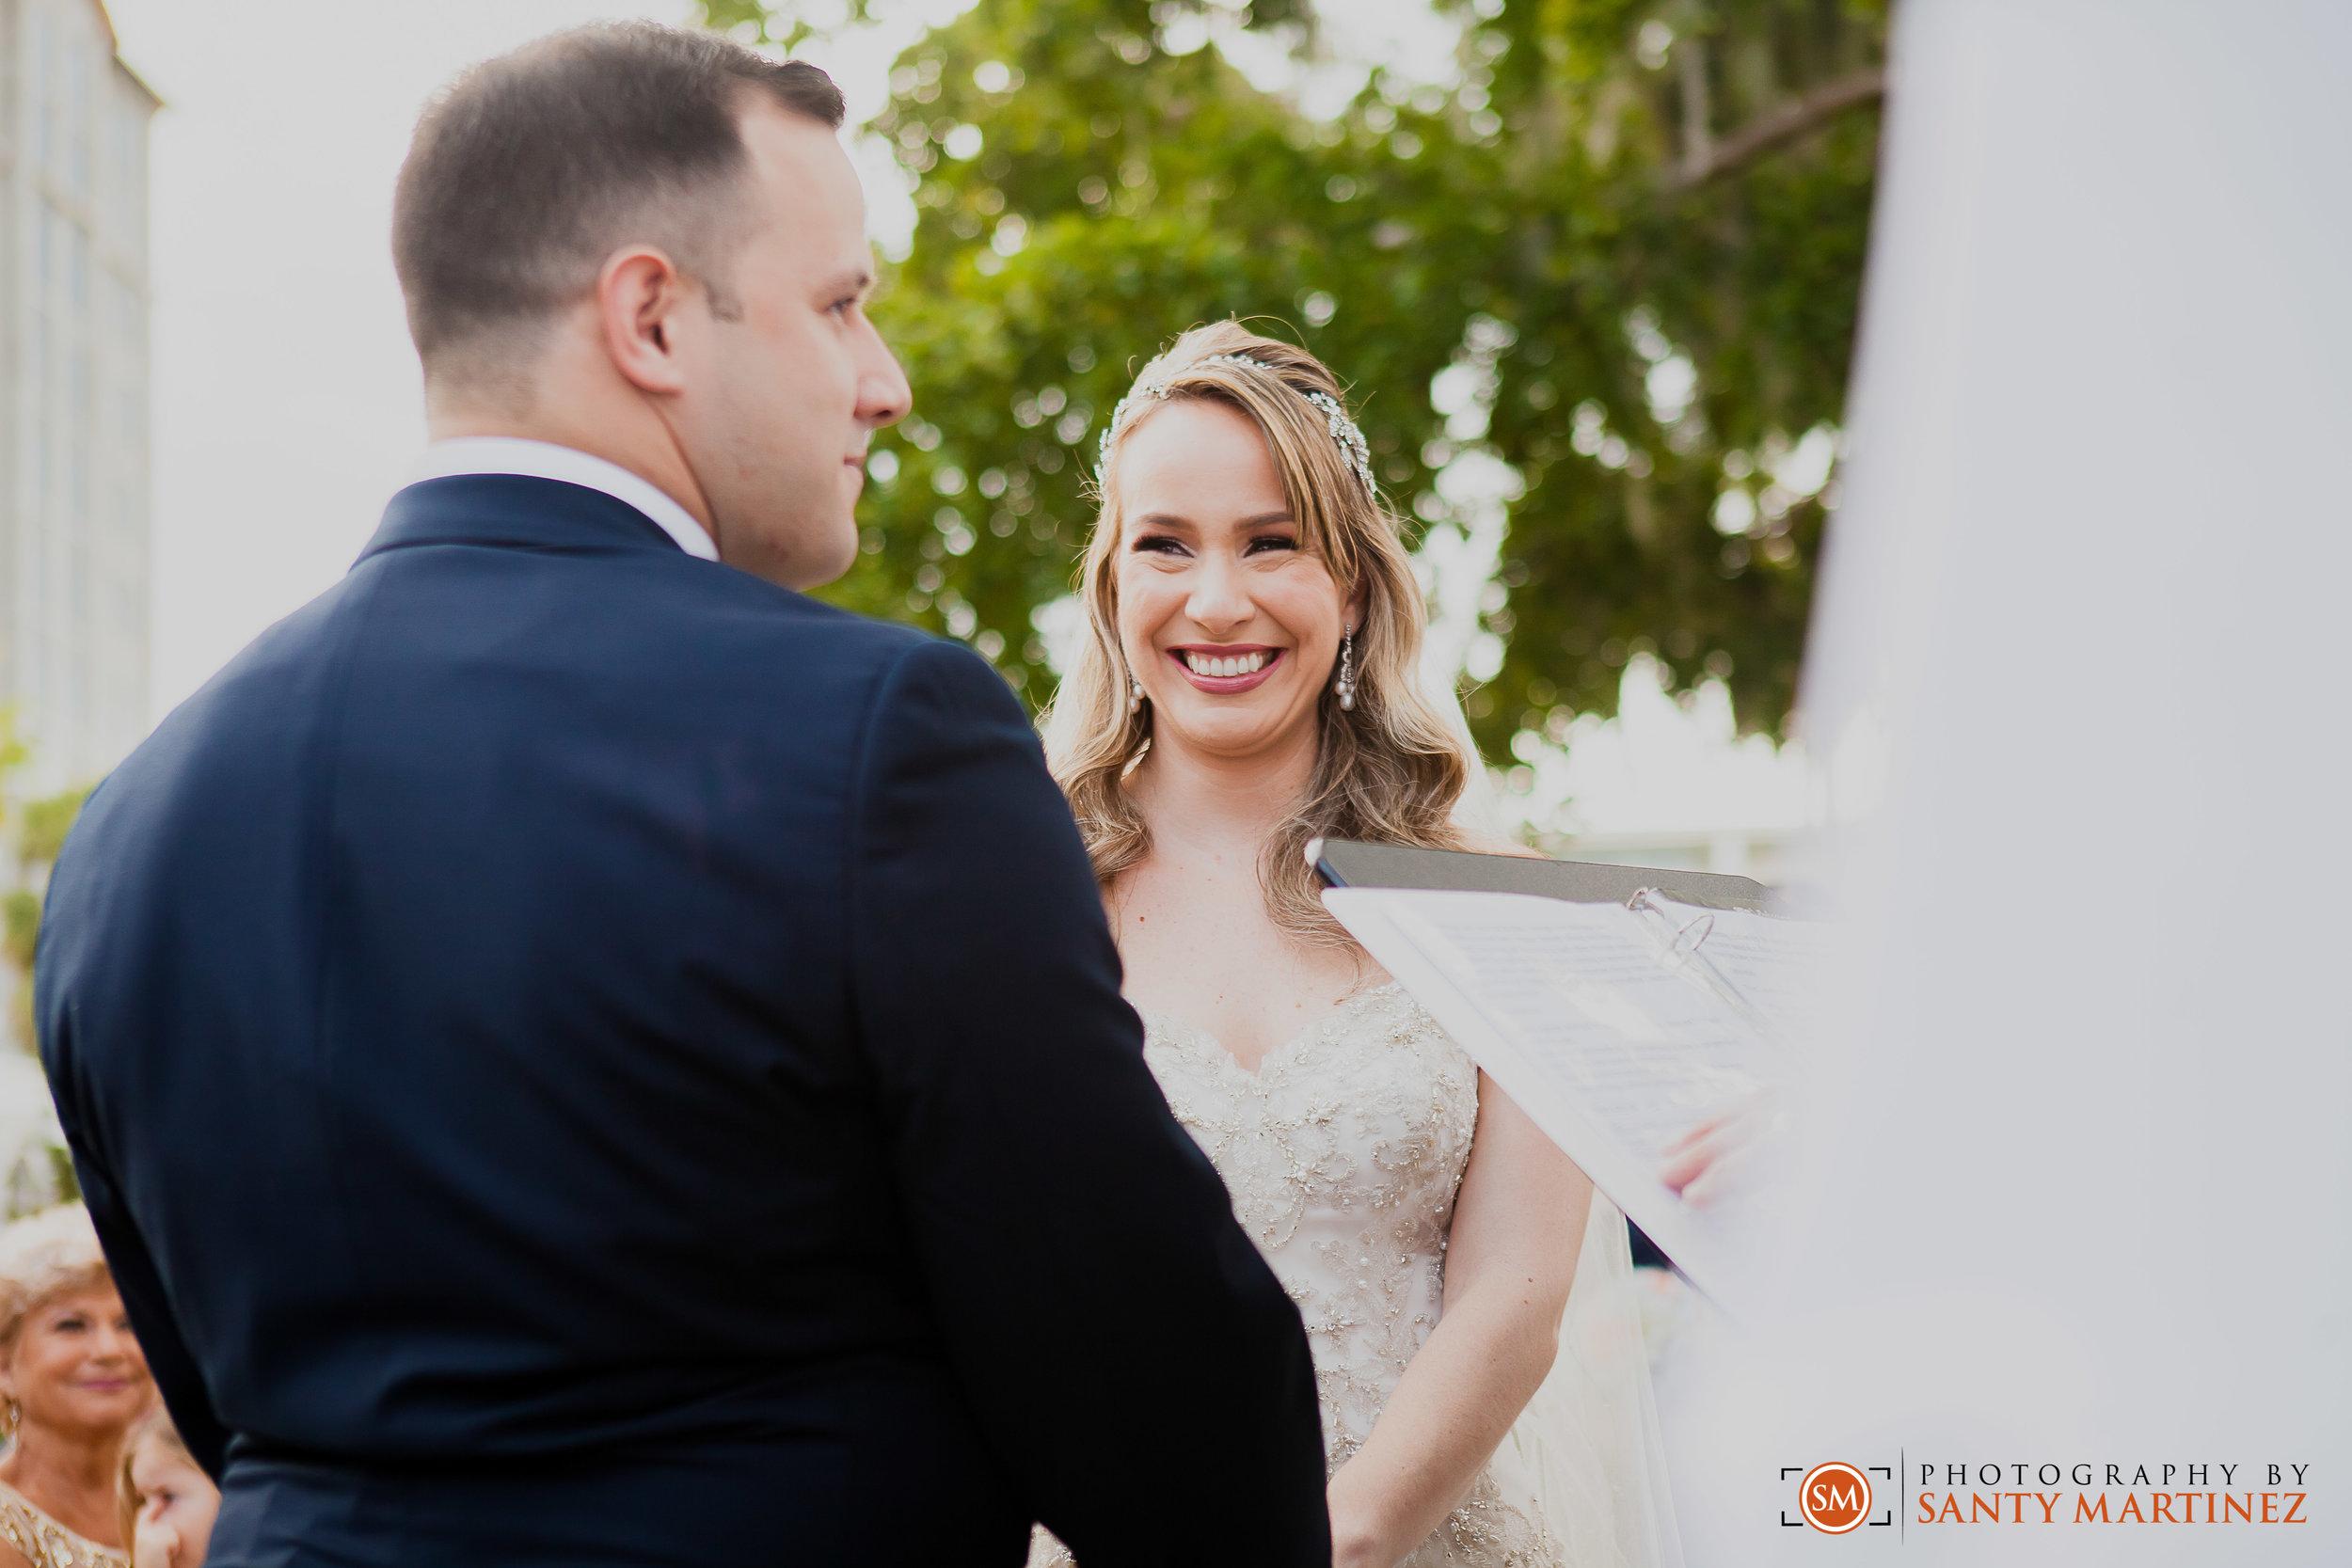 Wedding La Jolla Ballroom - Photography by Santy Martinez-33.jpg